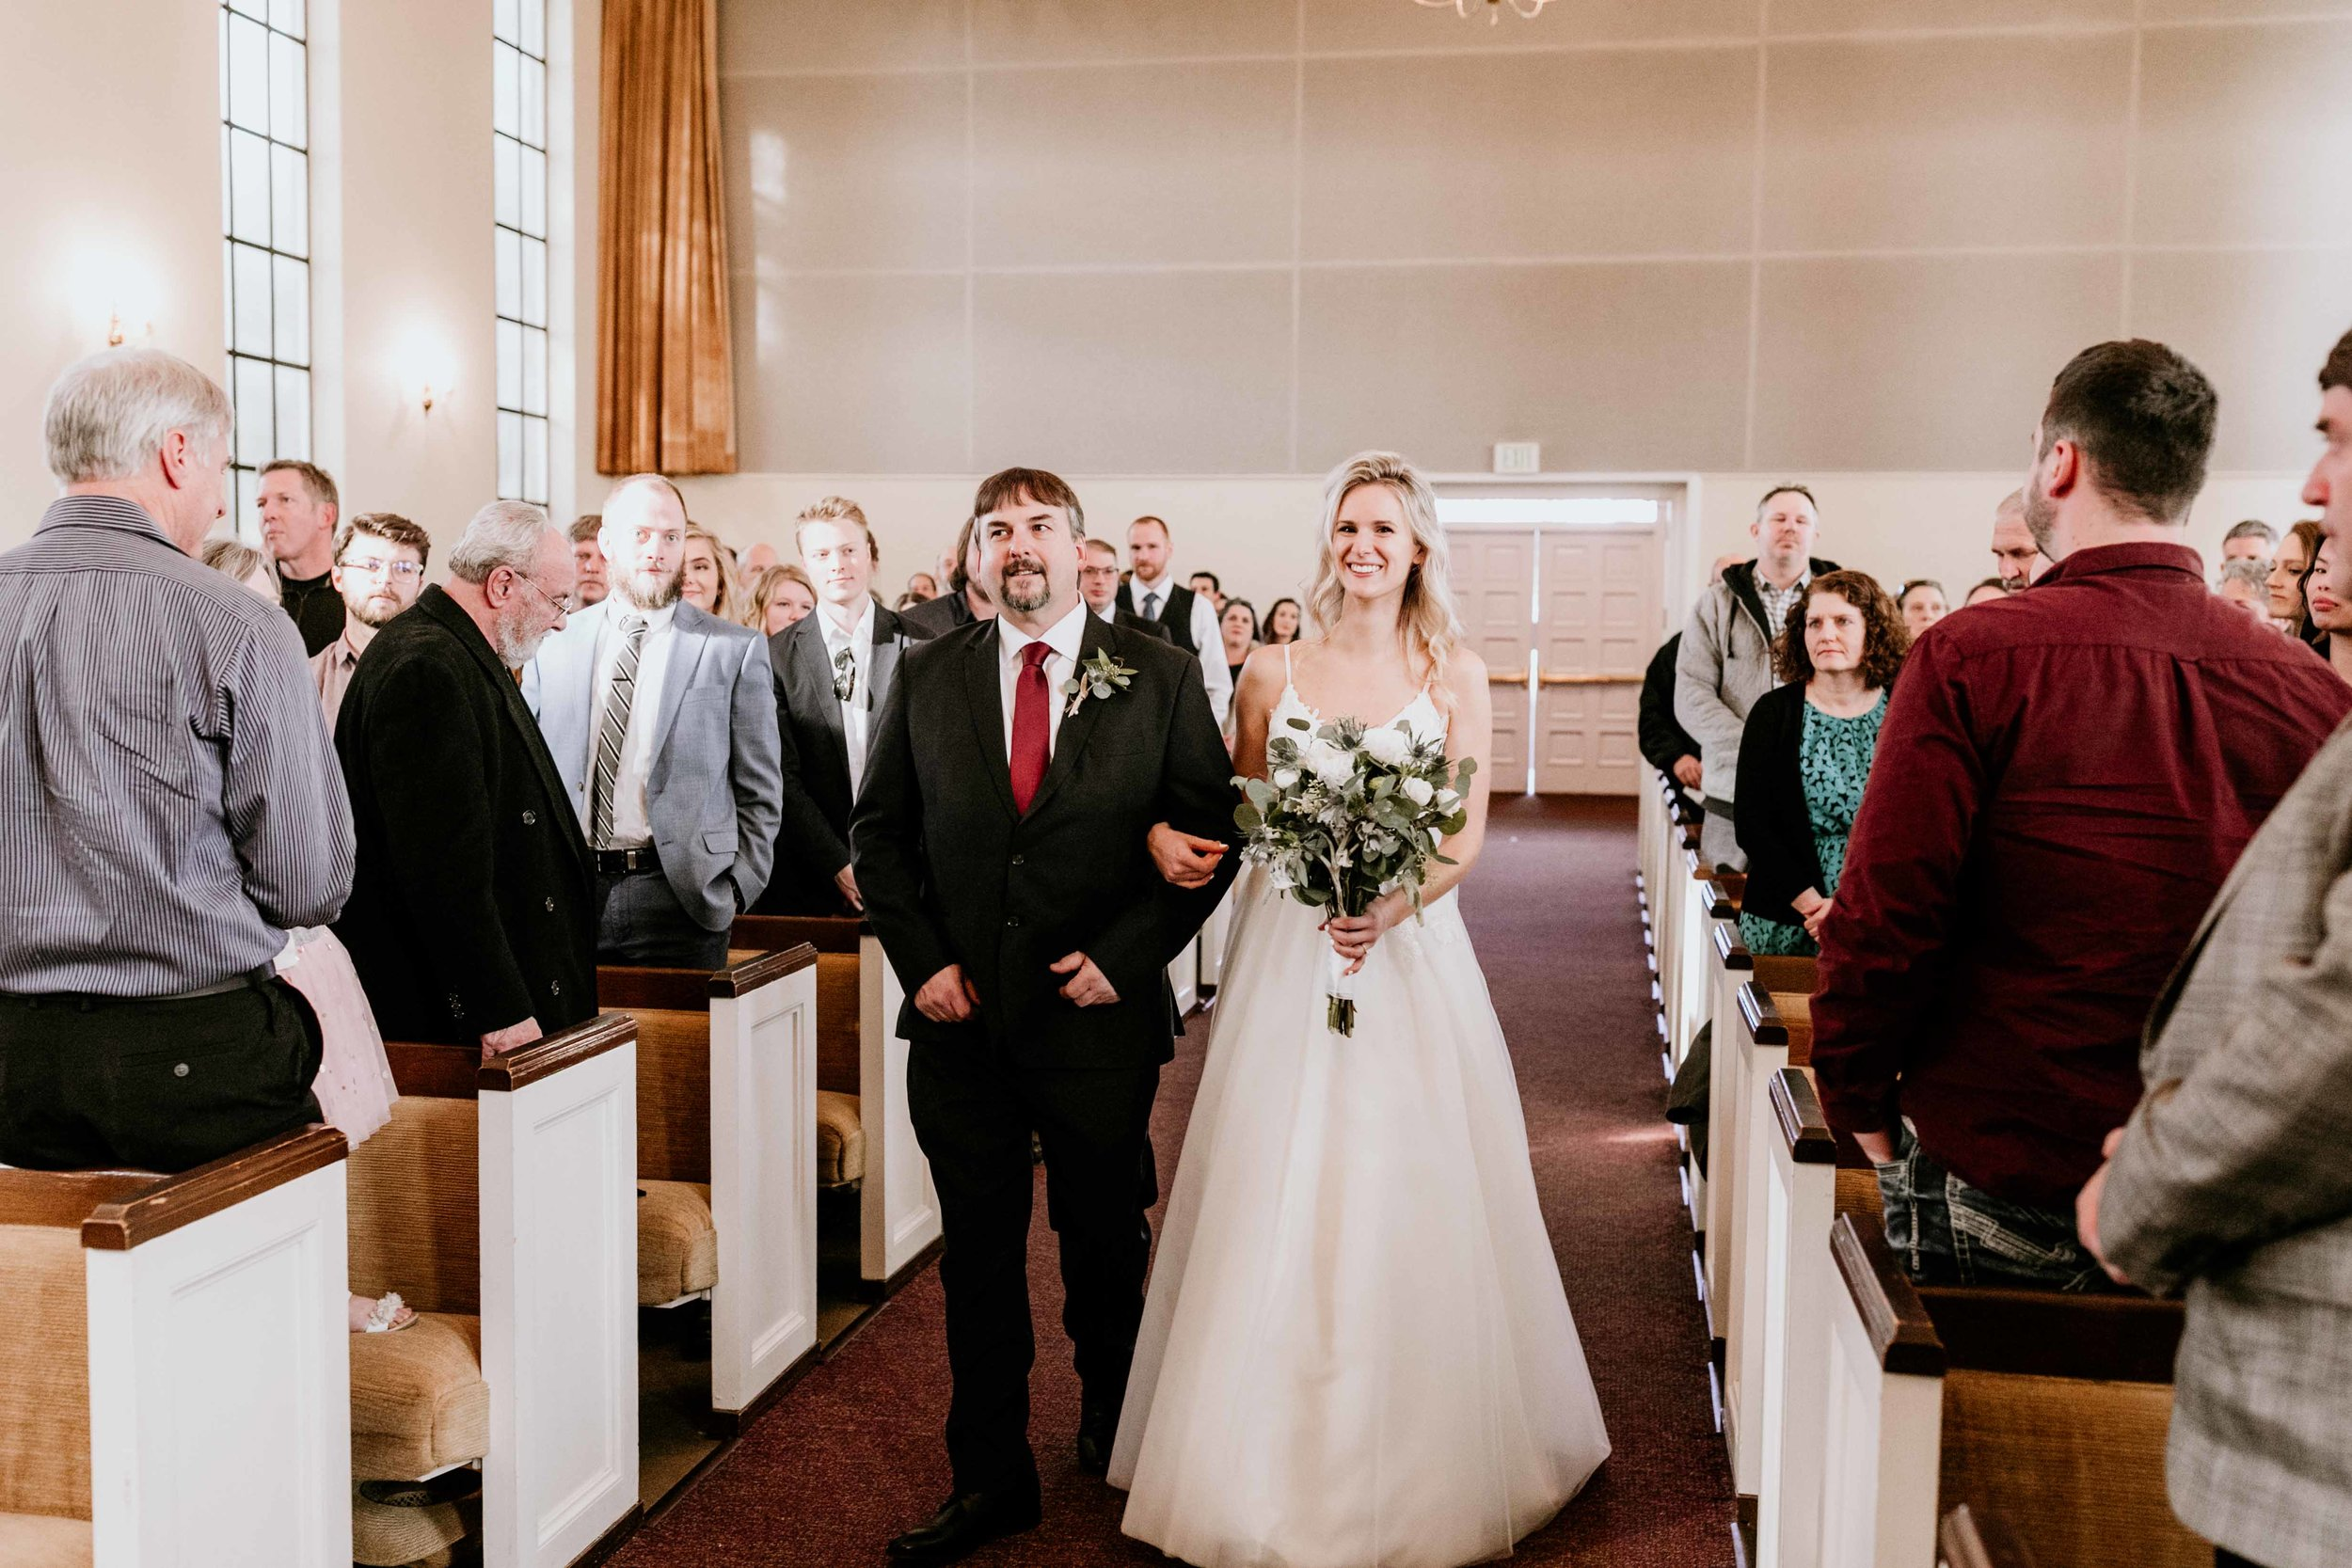 kilworth-memorial-chapel-wedding-61.jpg